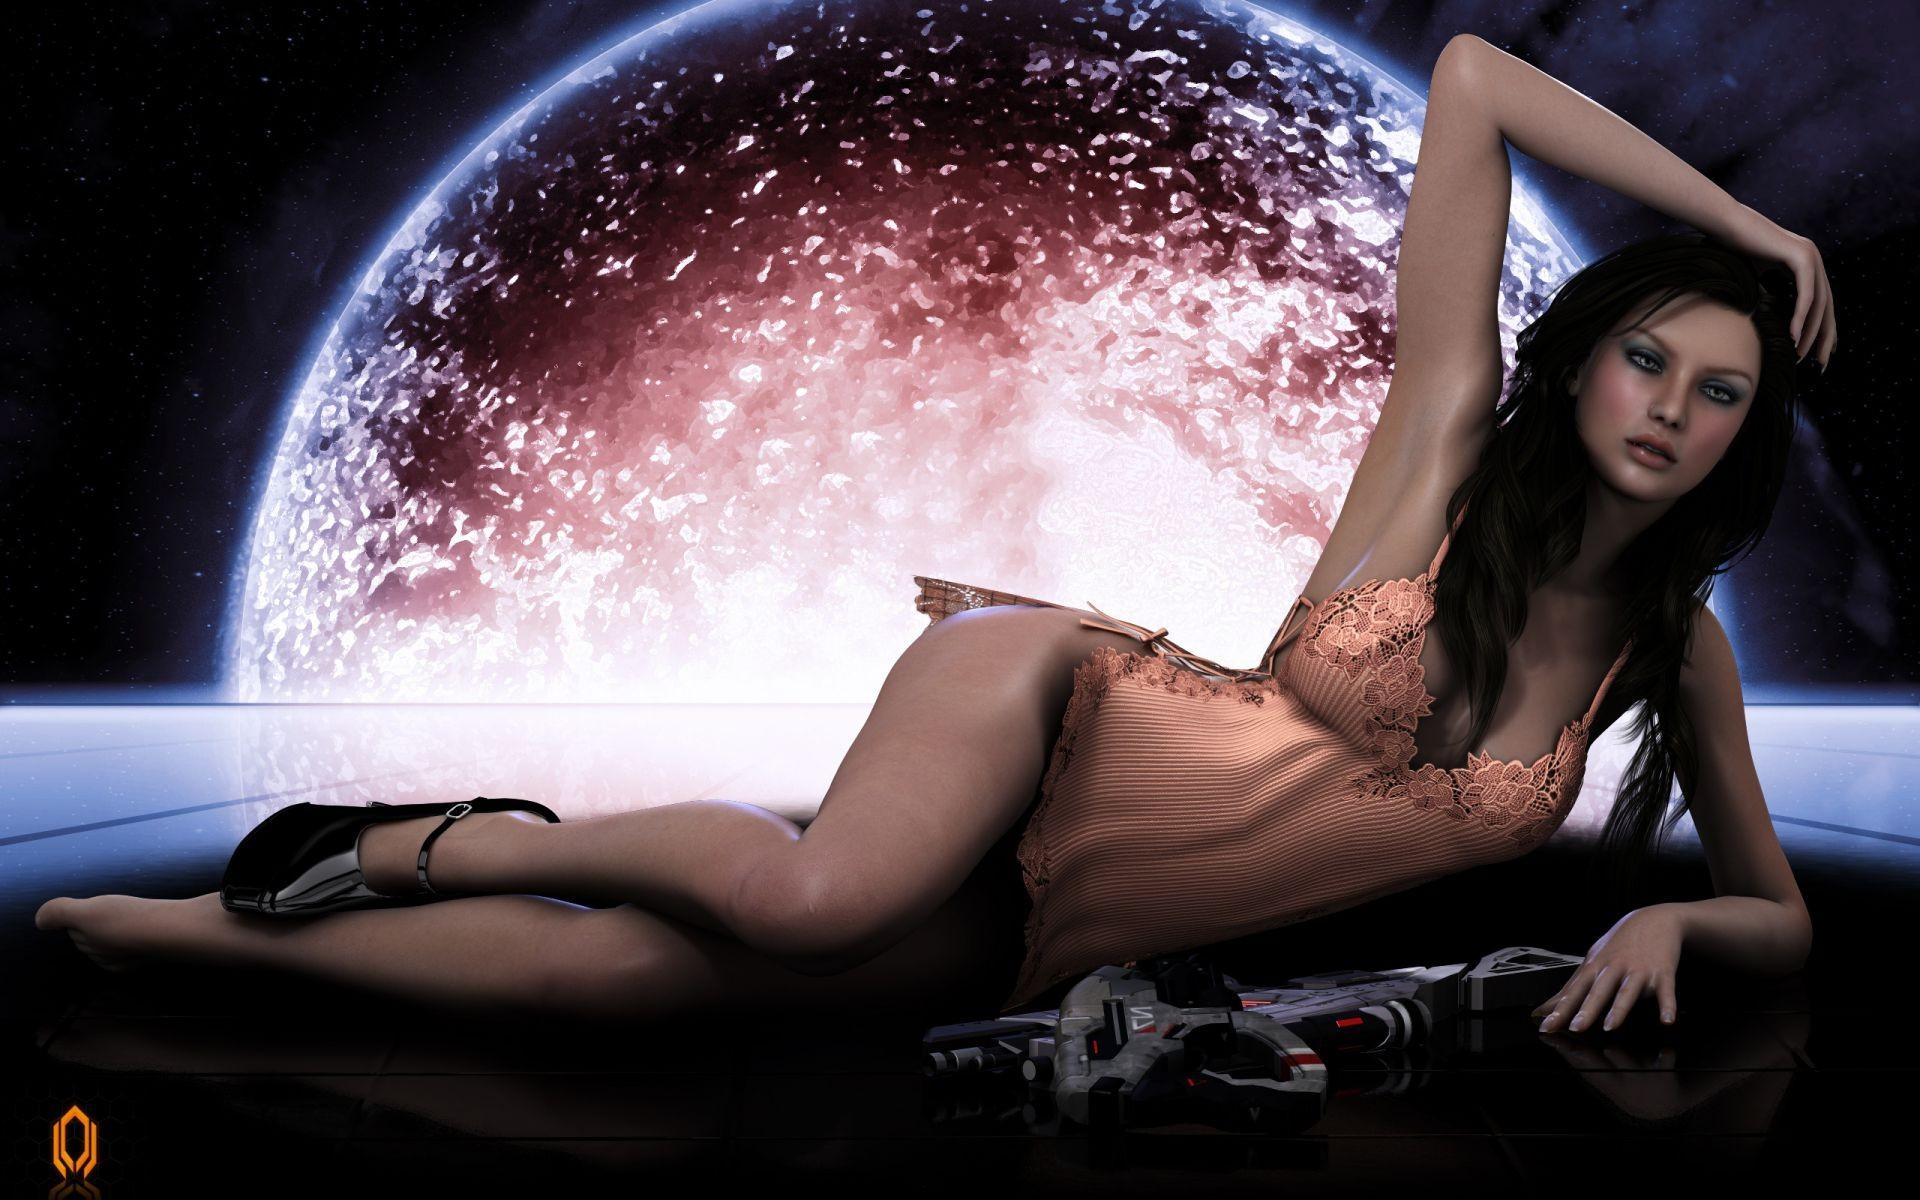 art wallpaper Girl nude woman fantasy